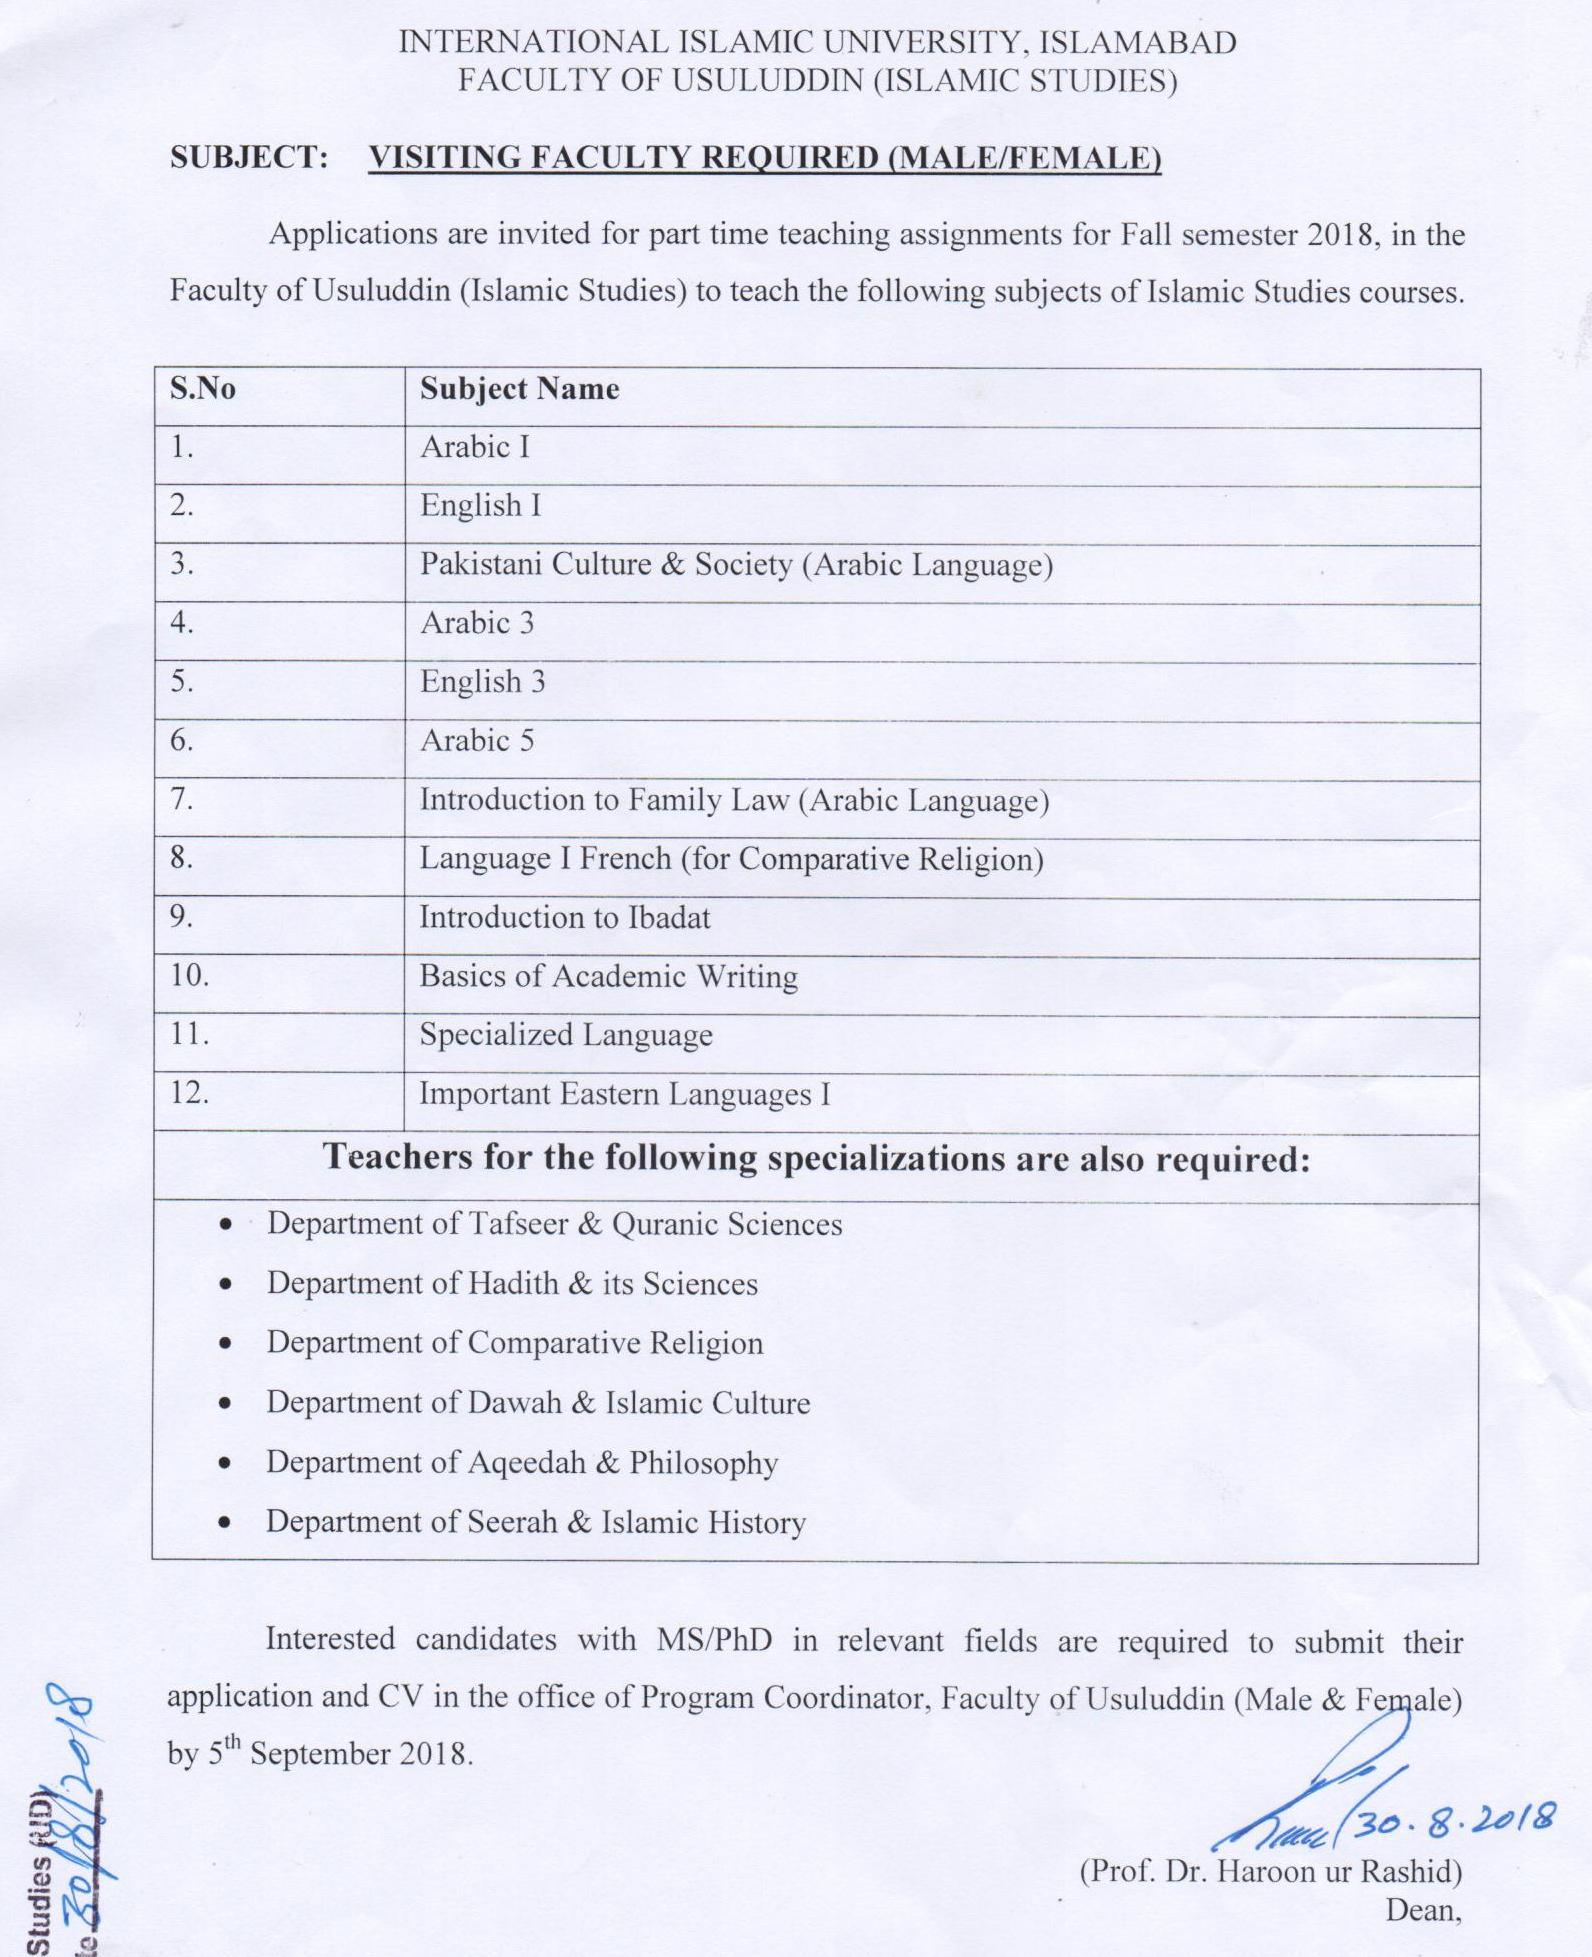 Job Archives | International Islamic University